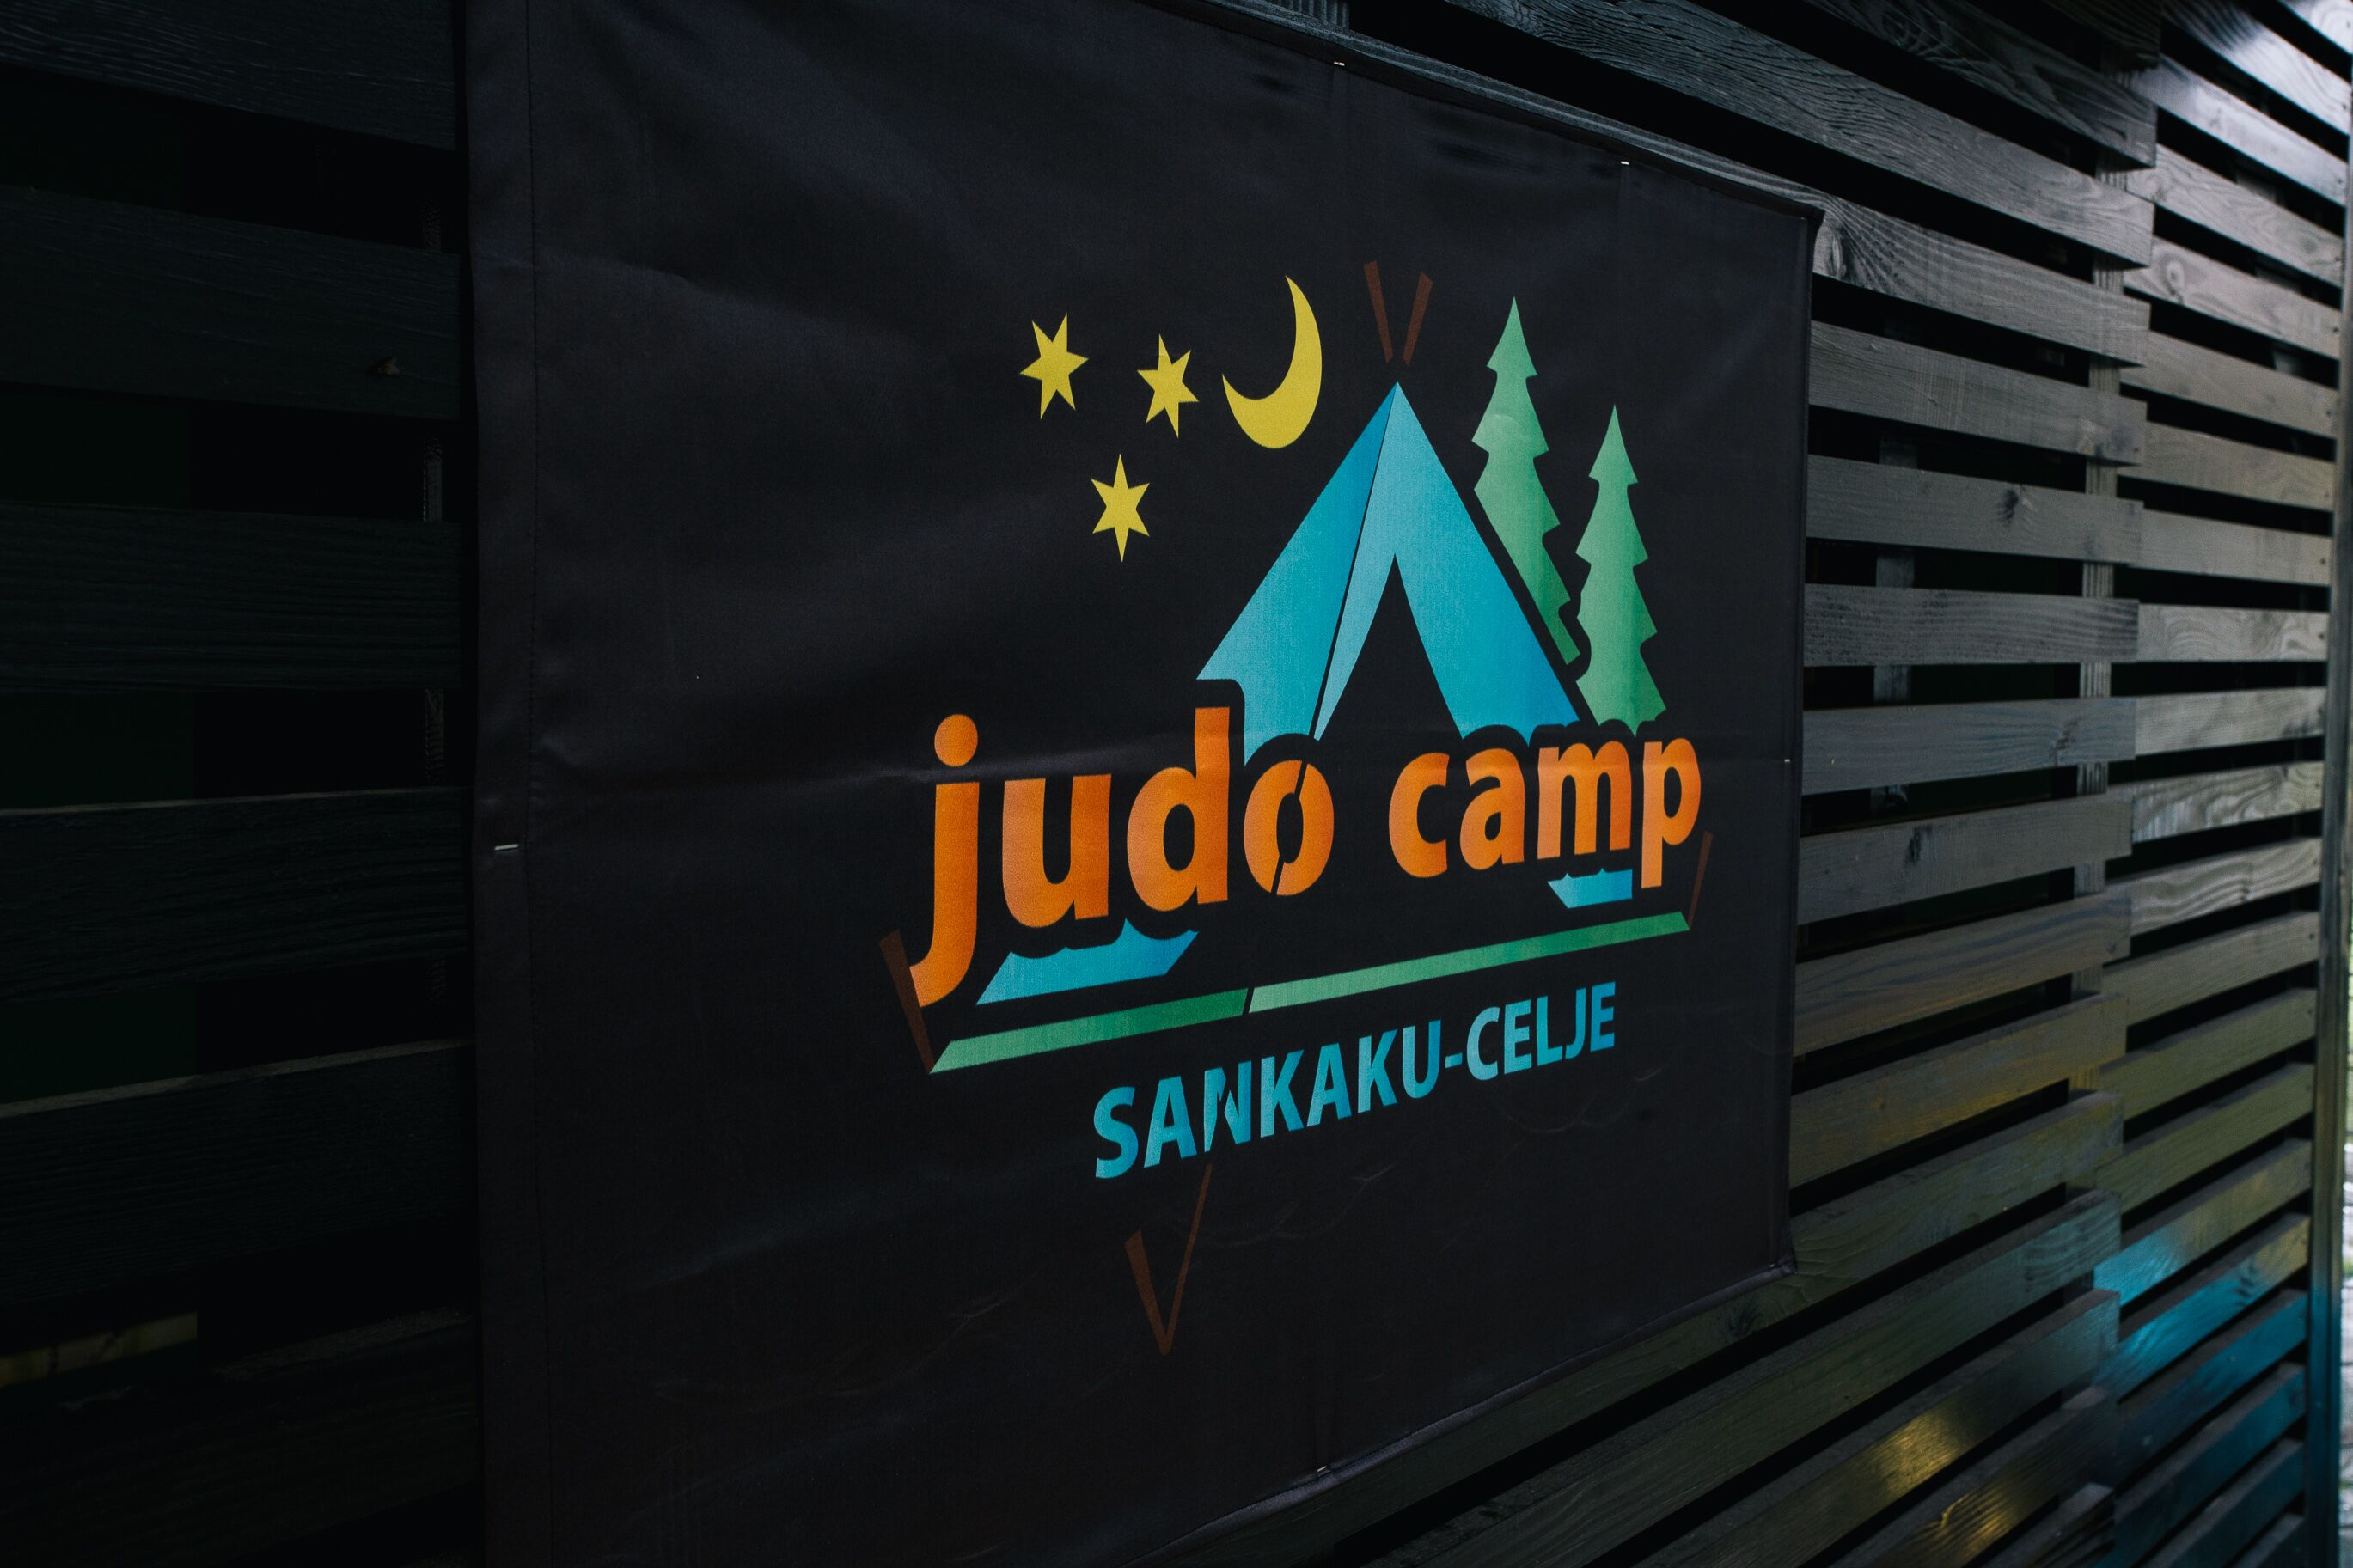 Judo Kamp